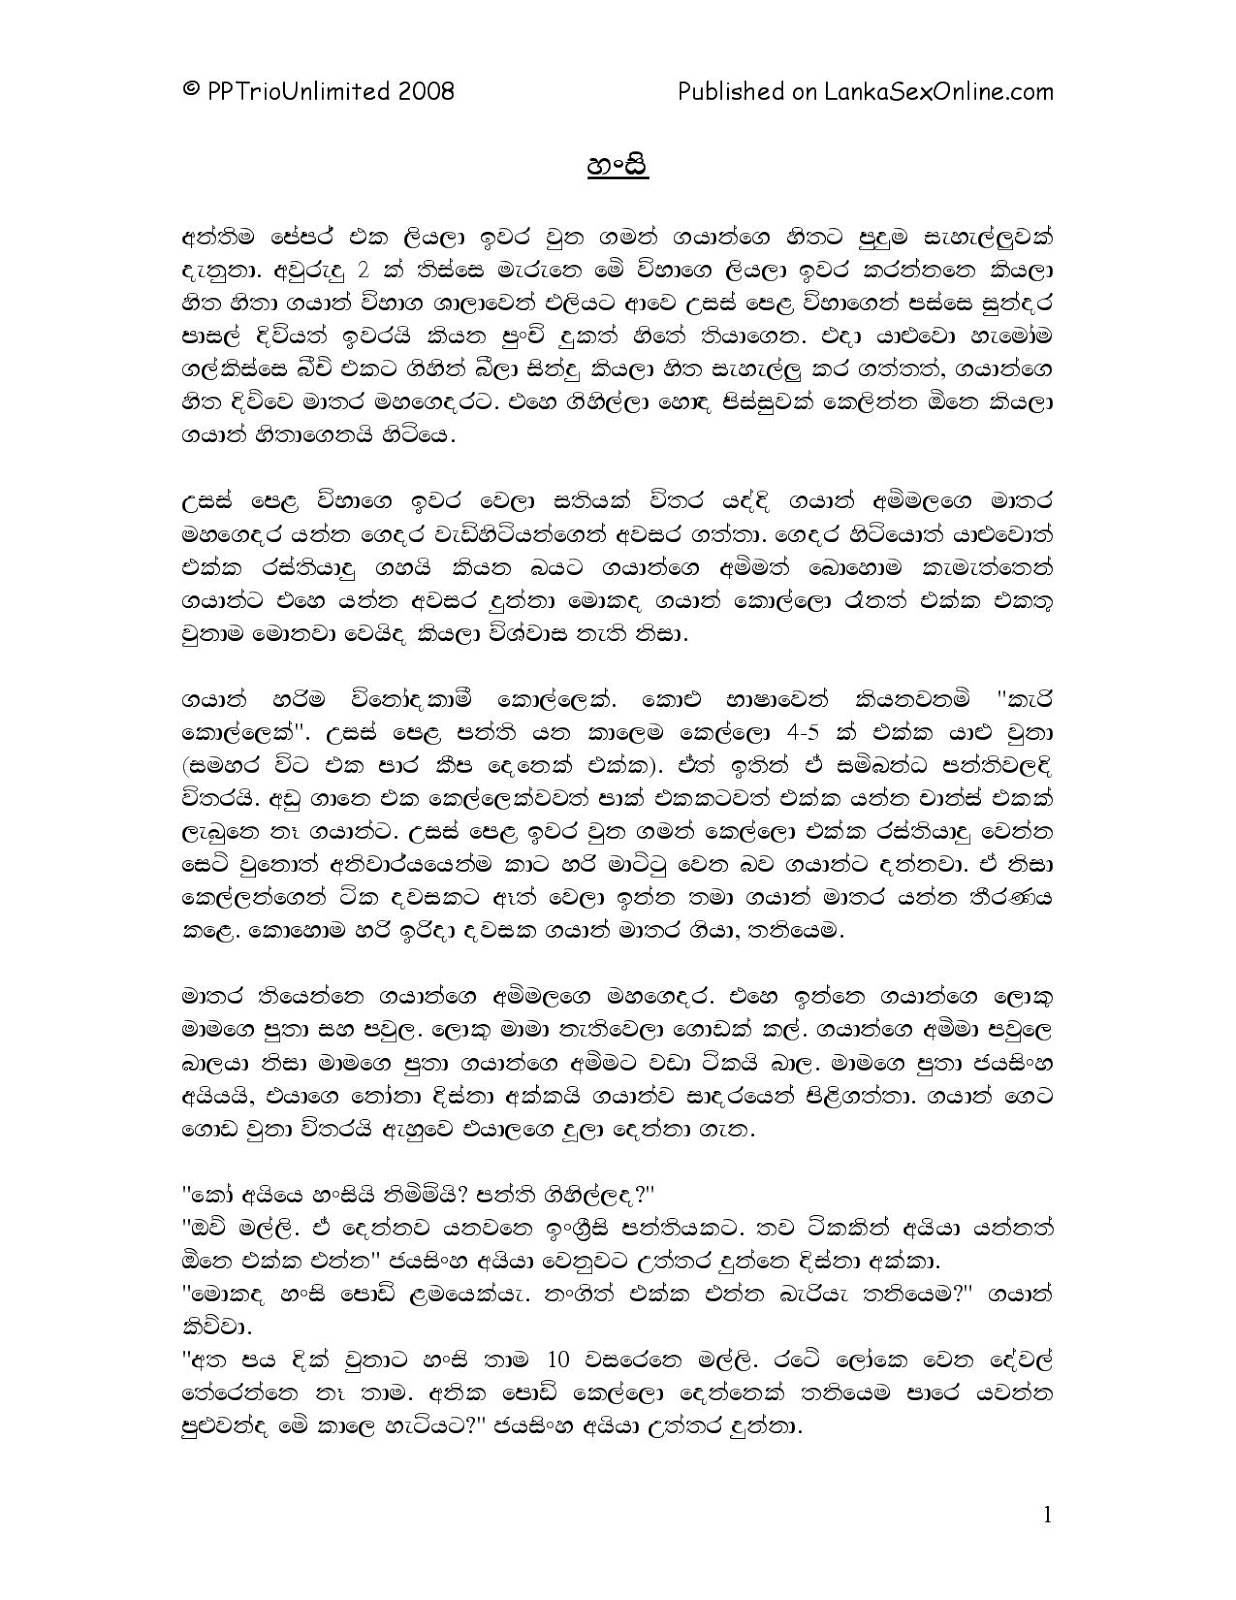 Sinhala Wal Katha Ammai Puthai - Aluth Wal Katha Sinhala